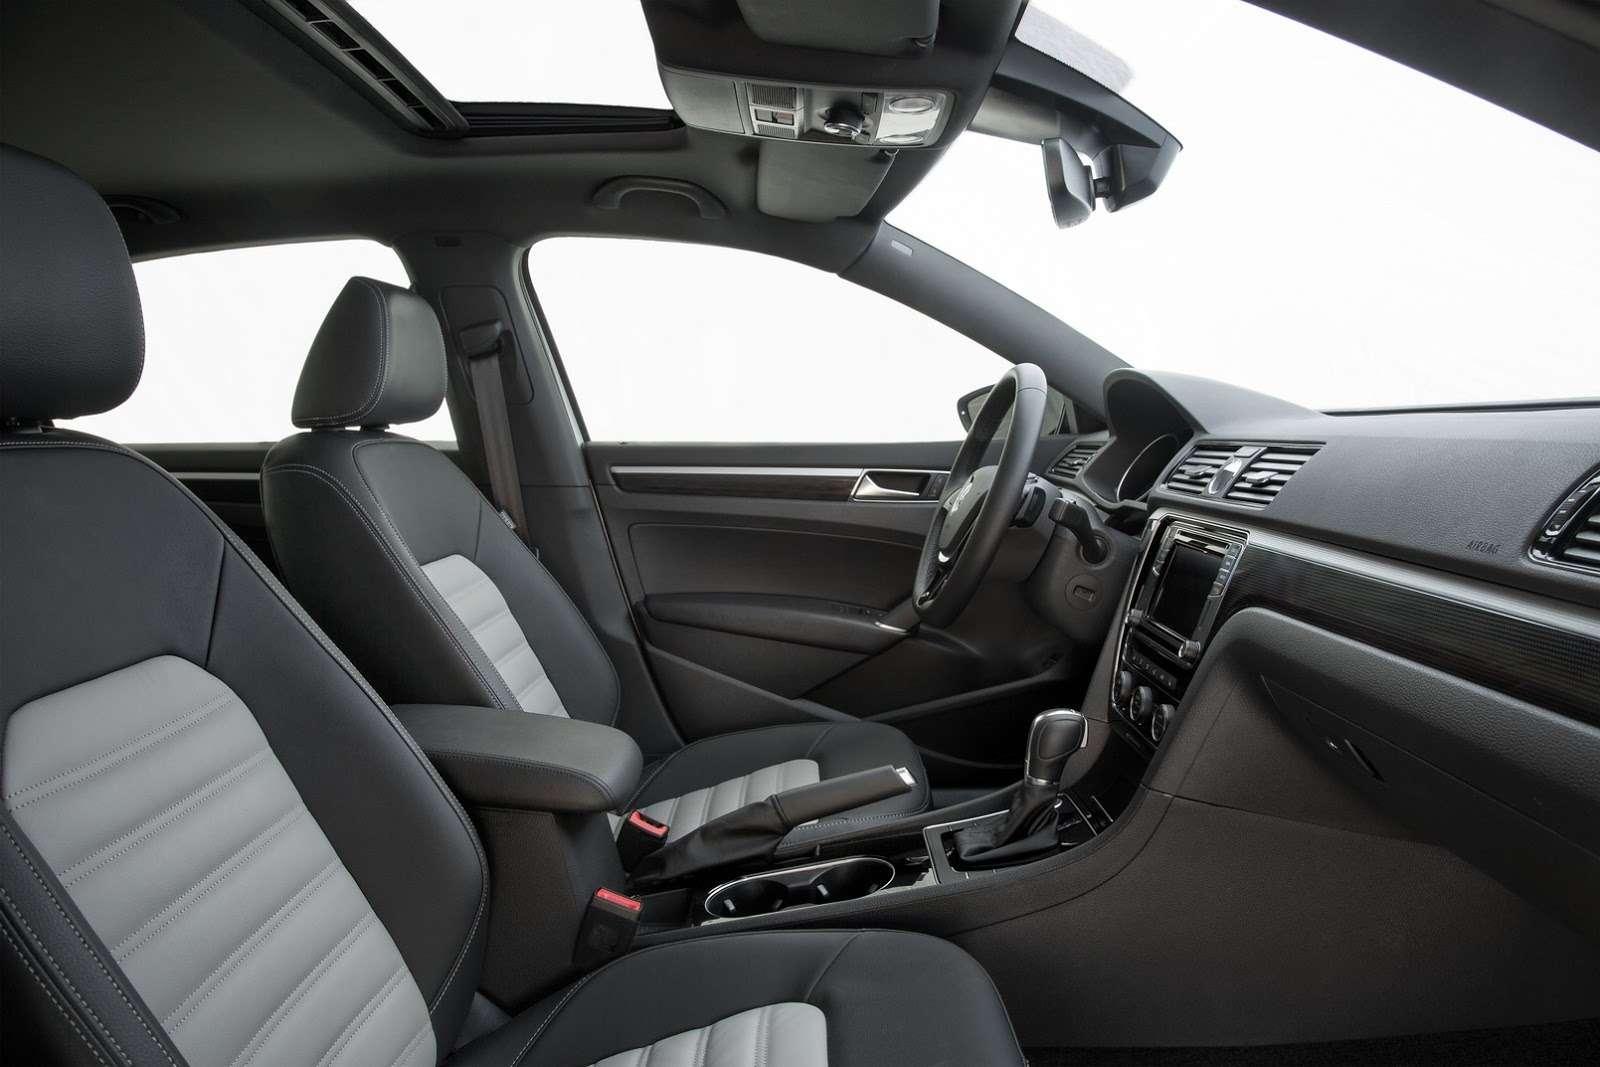 Концепт-иллюзия: Volkswagen Passat GTприехал вЛос-Анджелес— фото 663883